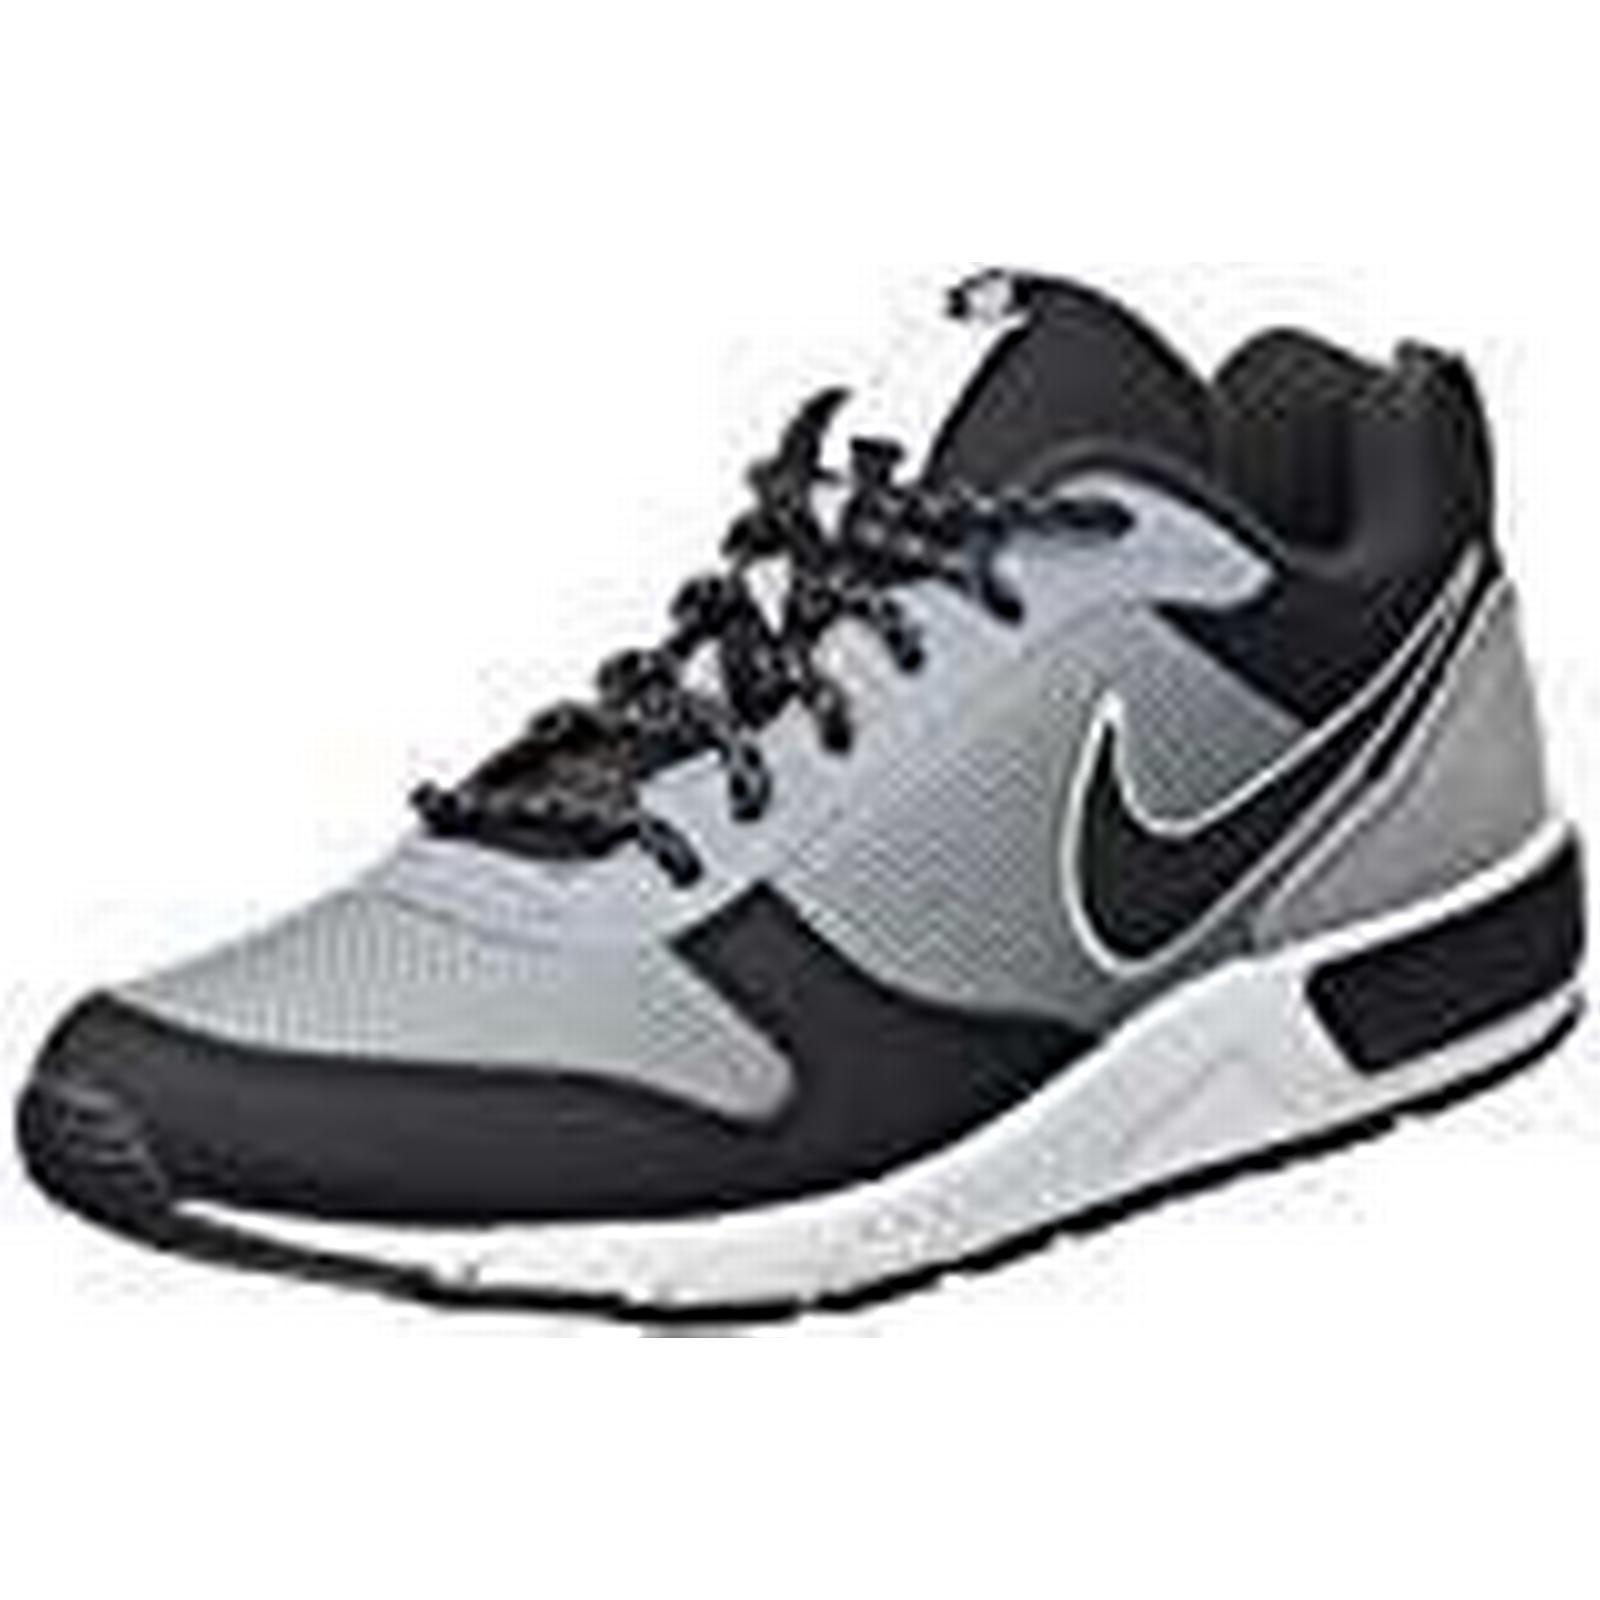 Nike Men's Nightgazer Trail Gym Shoes, Grey (Cool EU) Grayblackpure Platinum), 6 UK(39 EU) (Cool e5b4c9